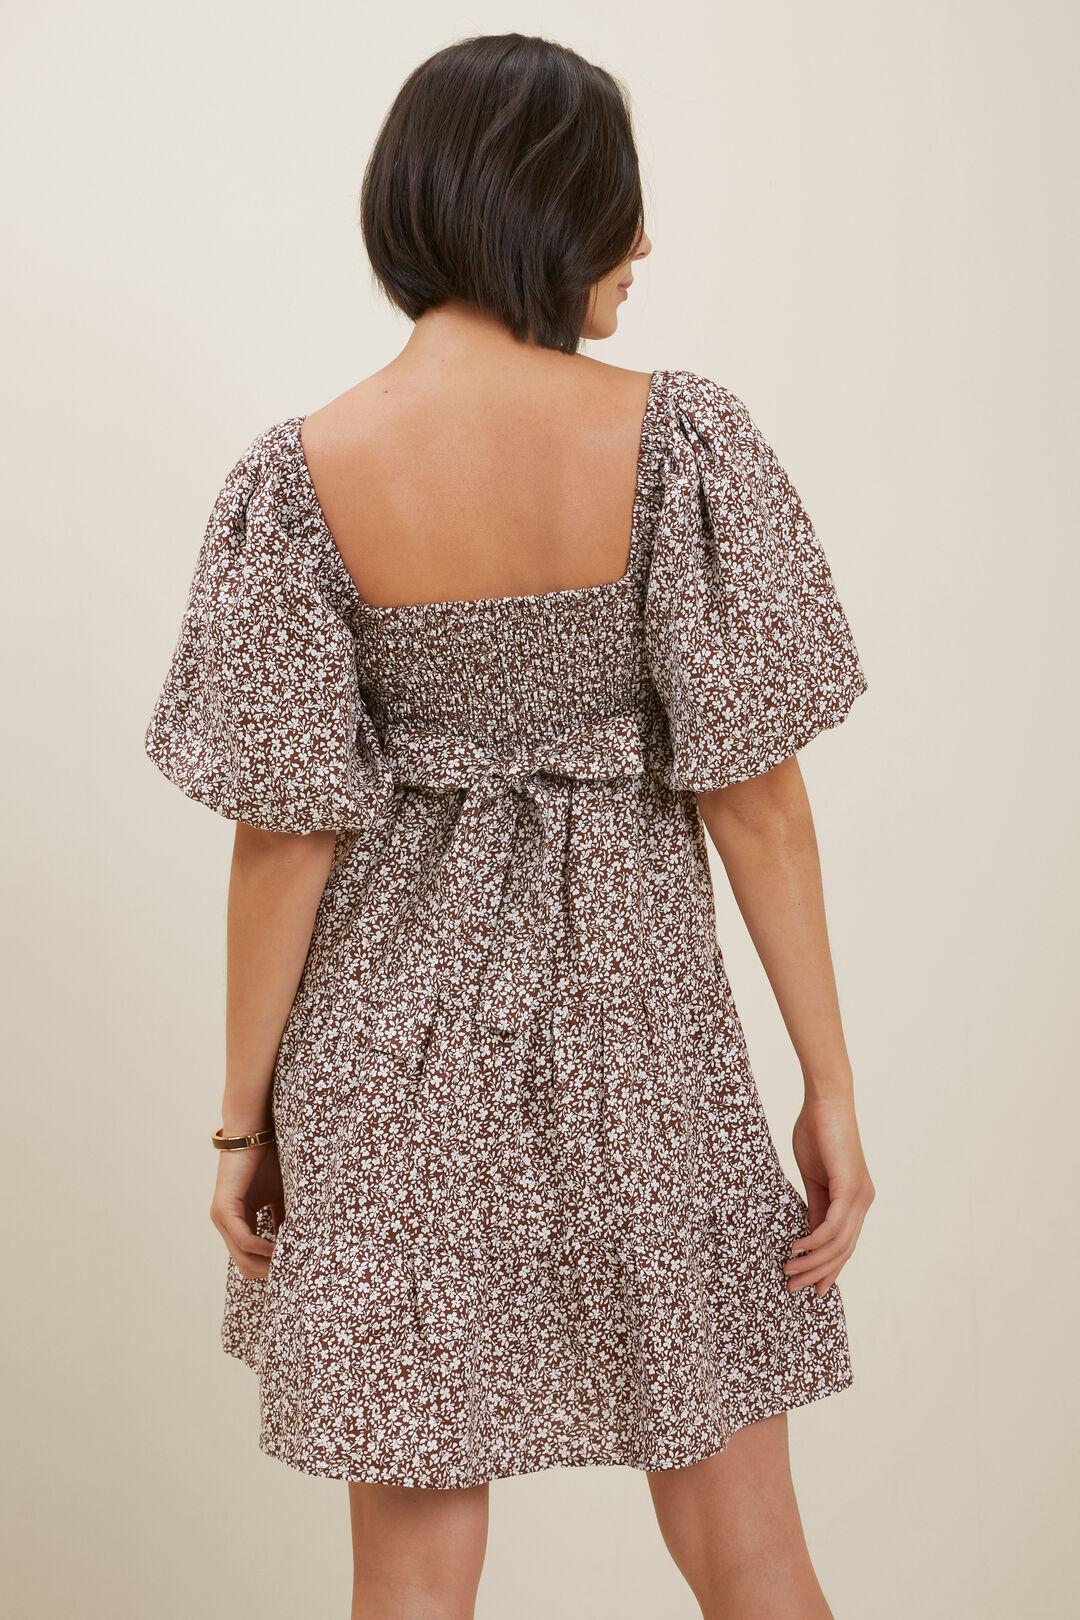 Linen Ditsy Mini Dress  RUSSET BROWN DITSY  hi-res